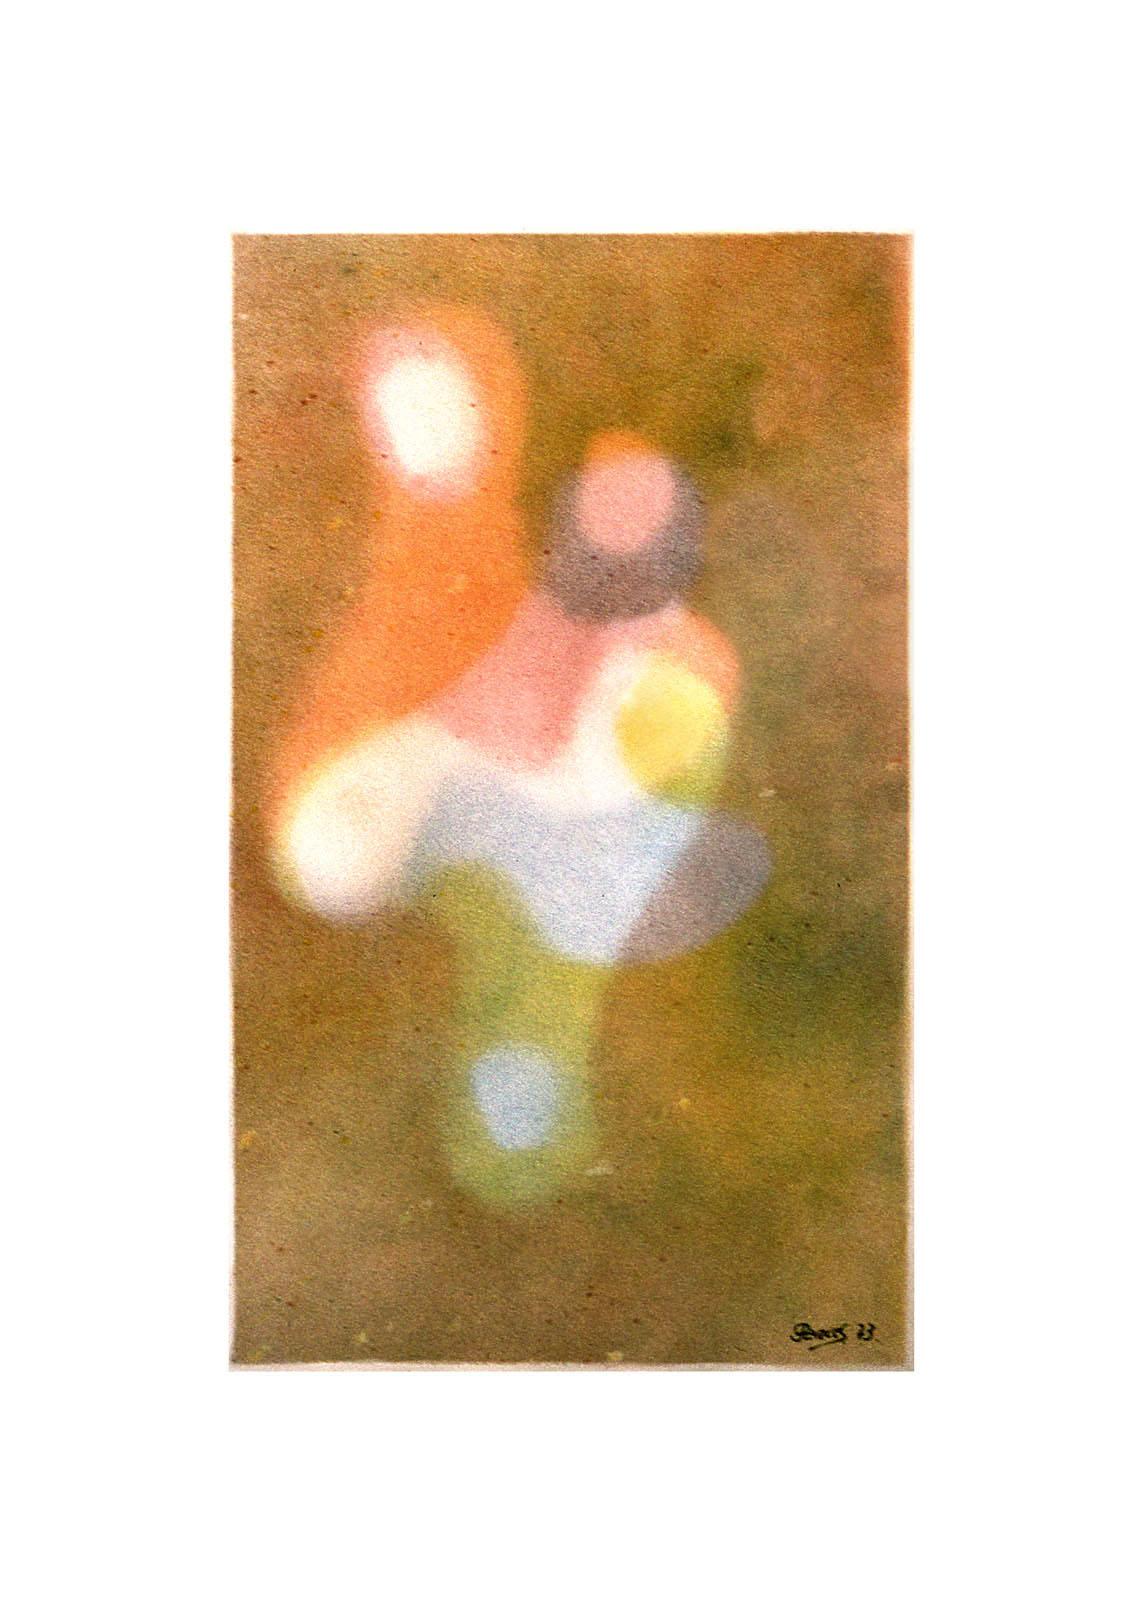 panies-danielvillalobos-spanish-painting-abstract-31